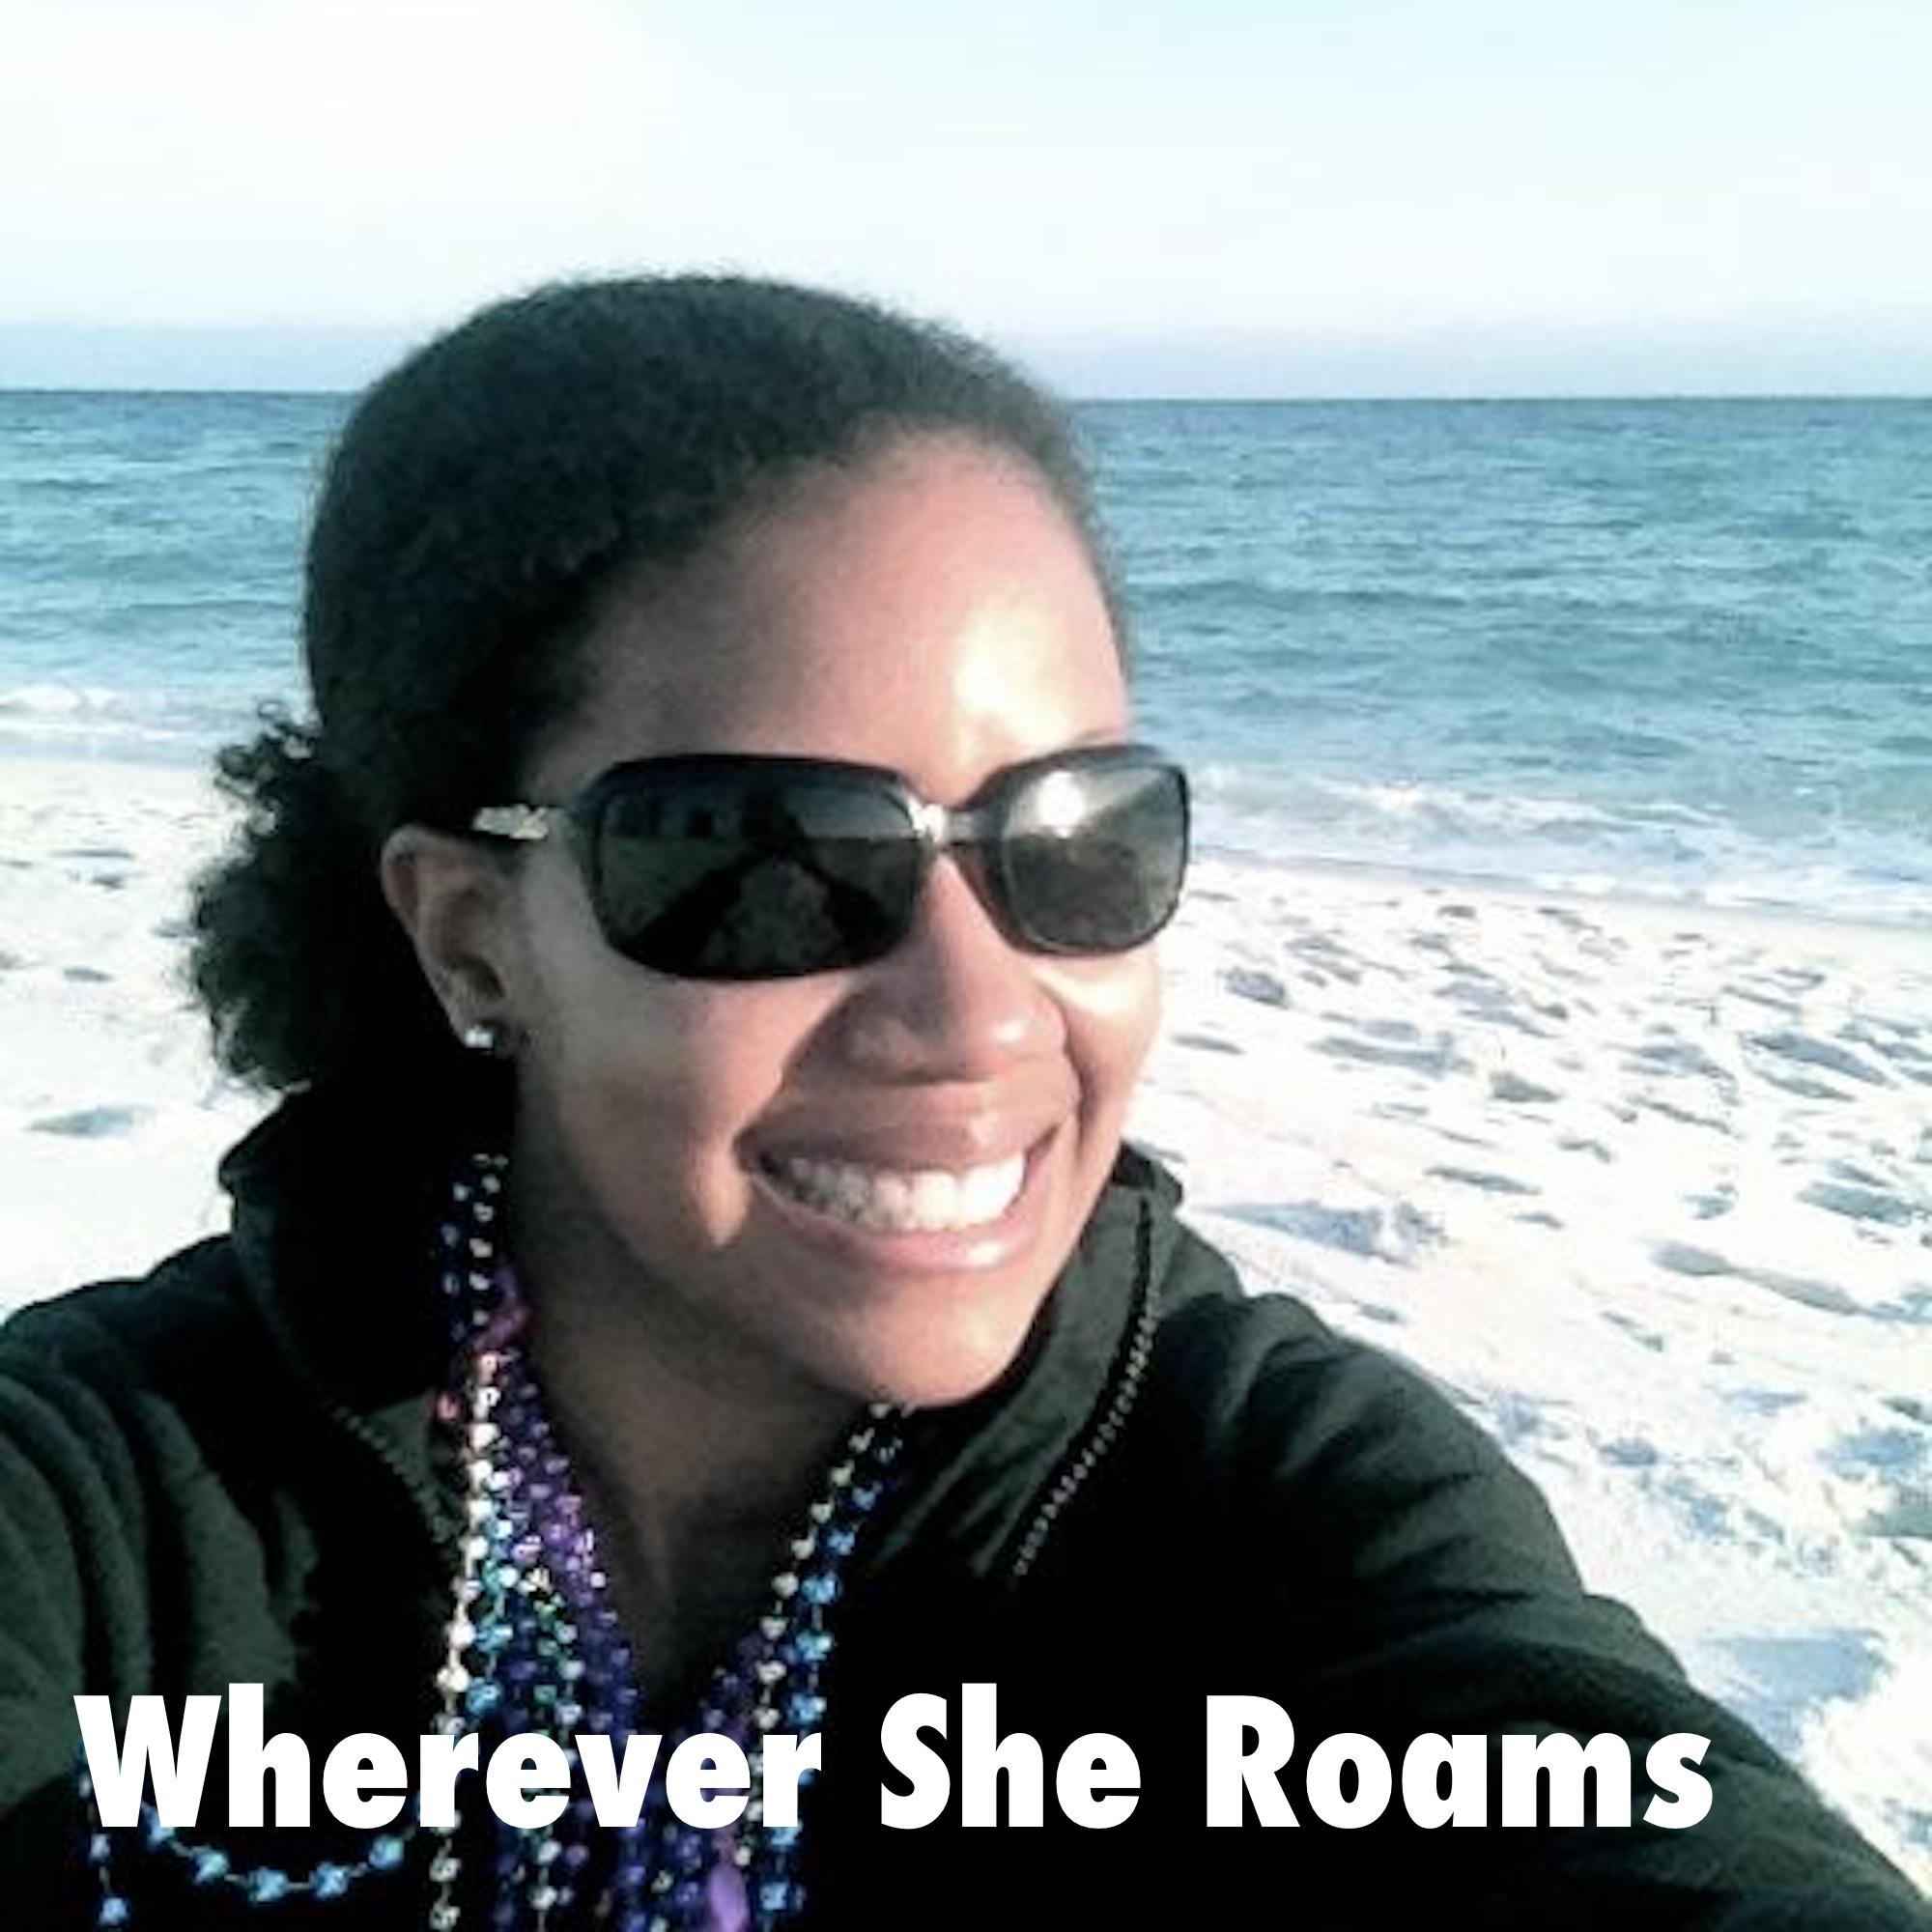 WhereverSheRoams